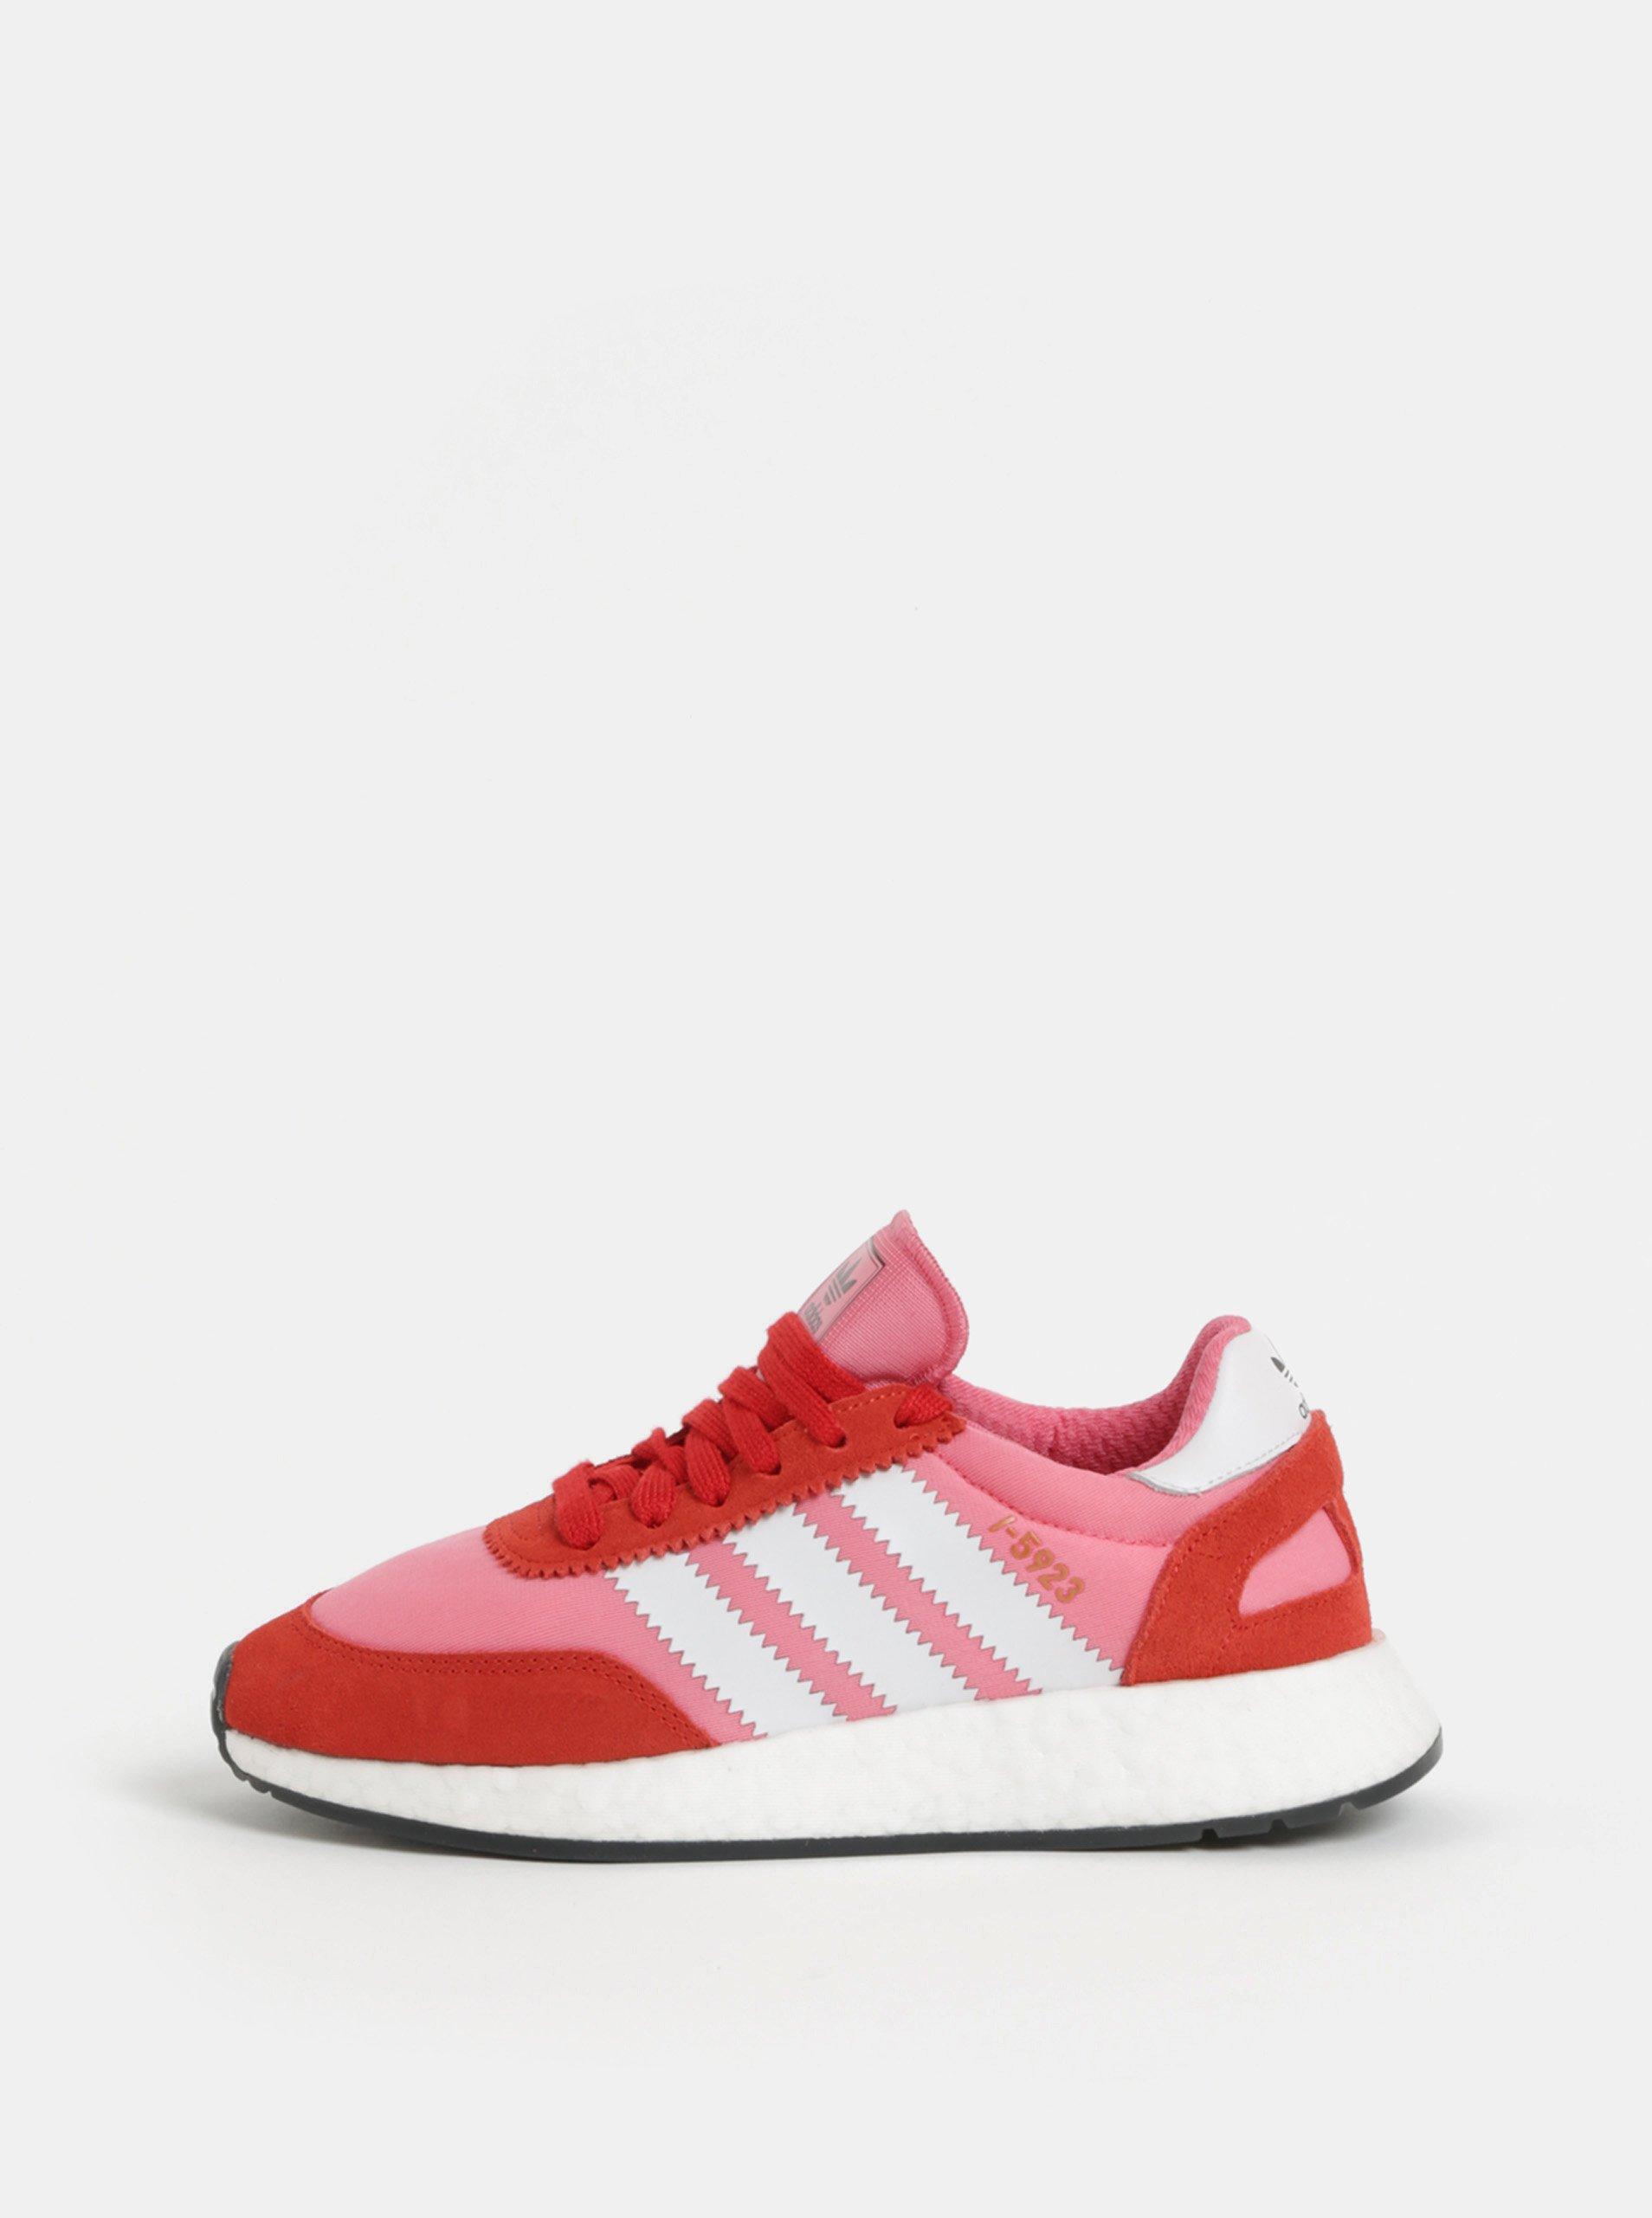 82223b9eb5c Červeno-růžové dámské tenisky se semišovými detaily adidas Originals Iniki  Runner